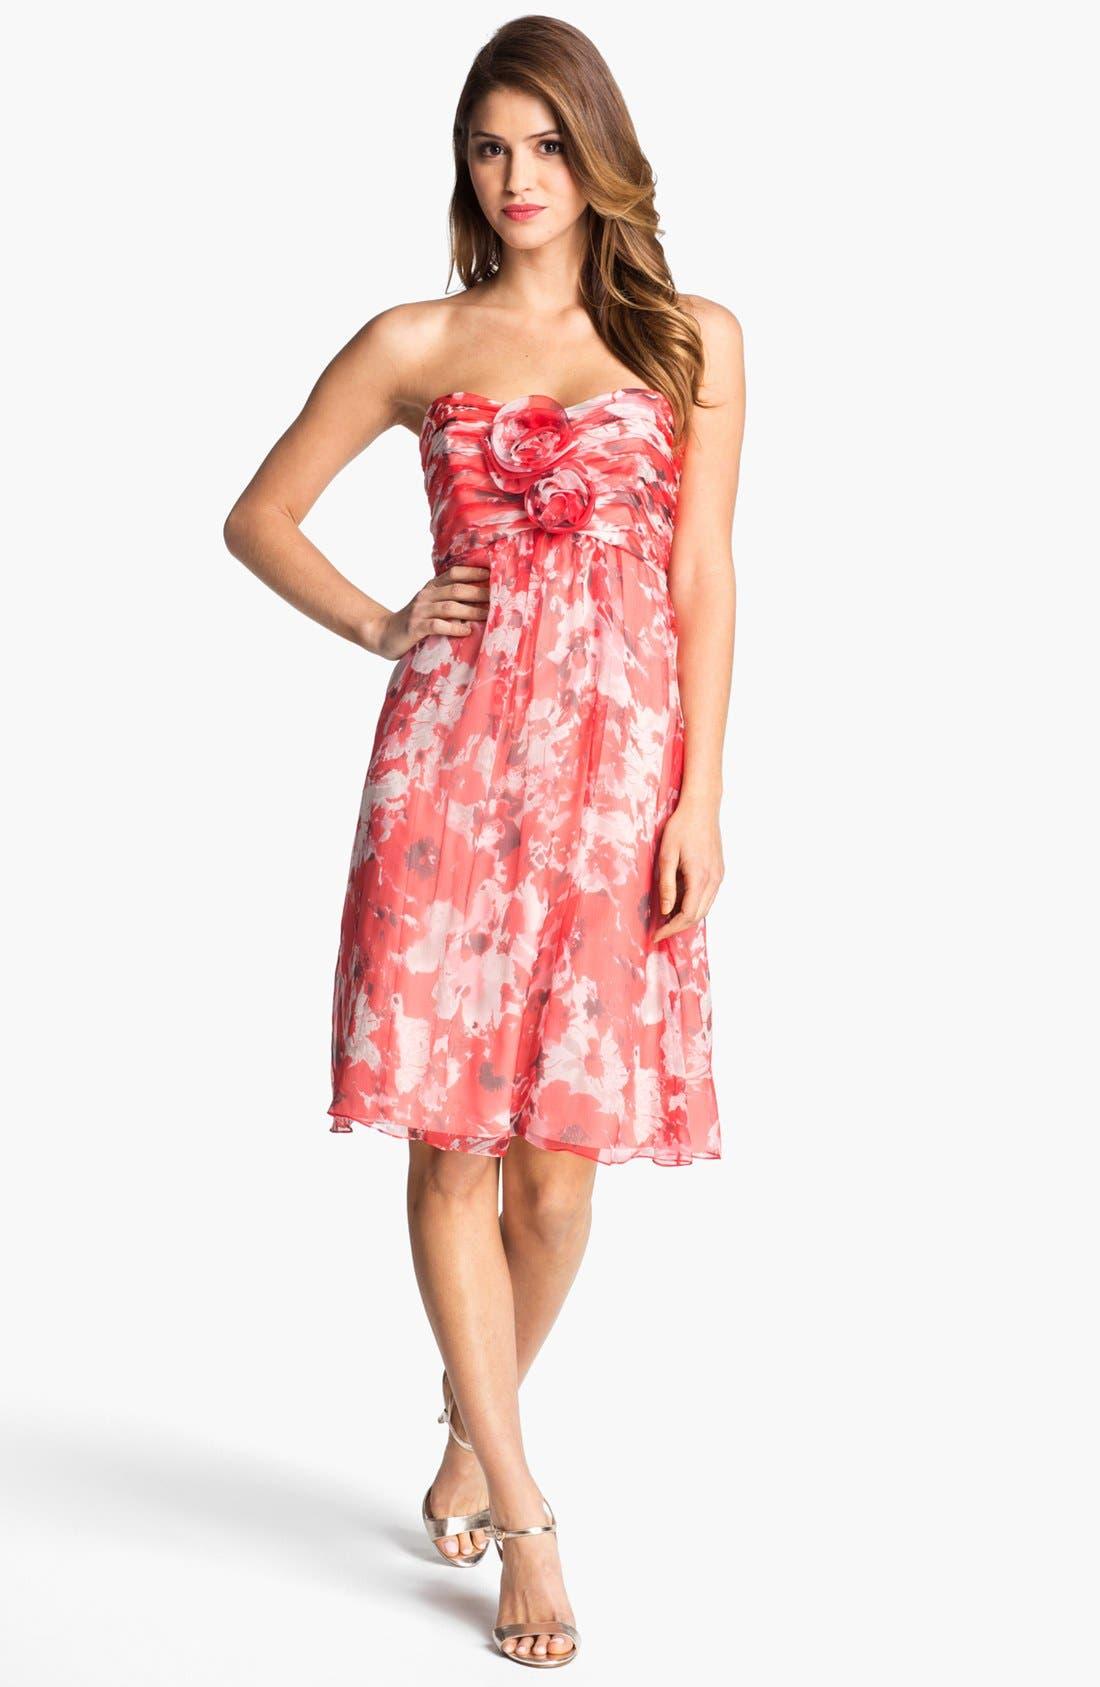 Alternate Image 1 Selected - Amsale 'Amore' Print Silk Chiffon Dress